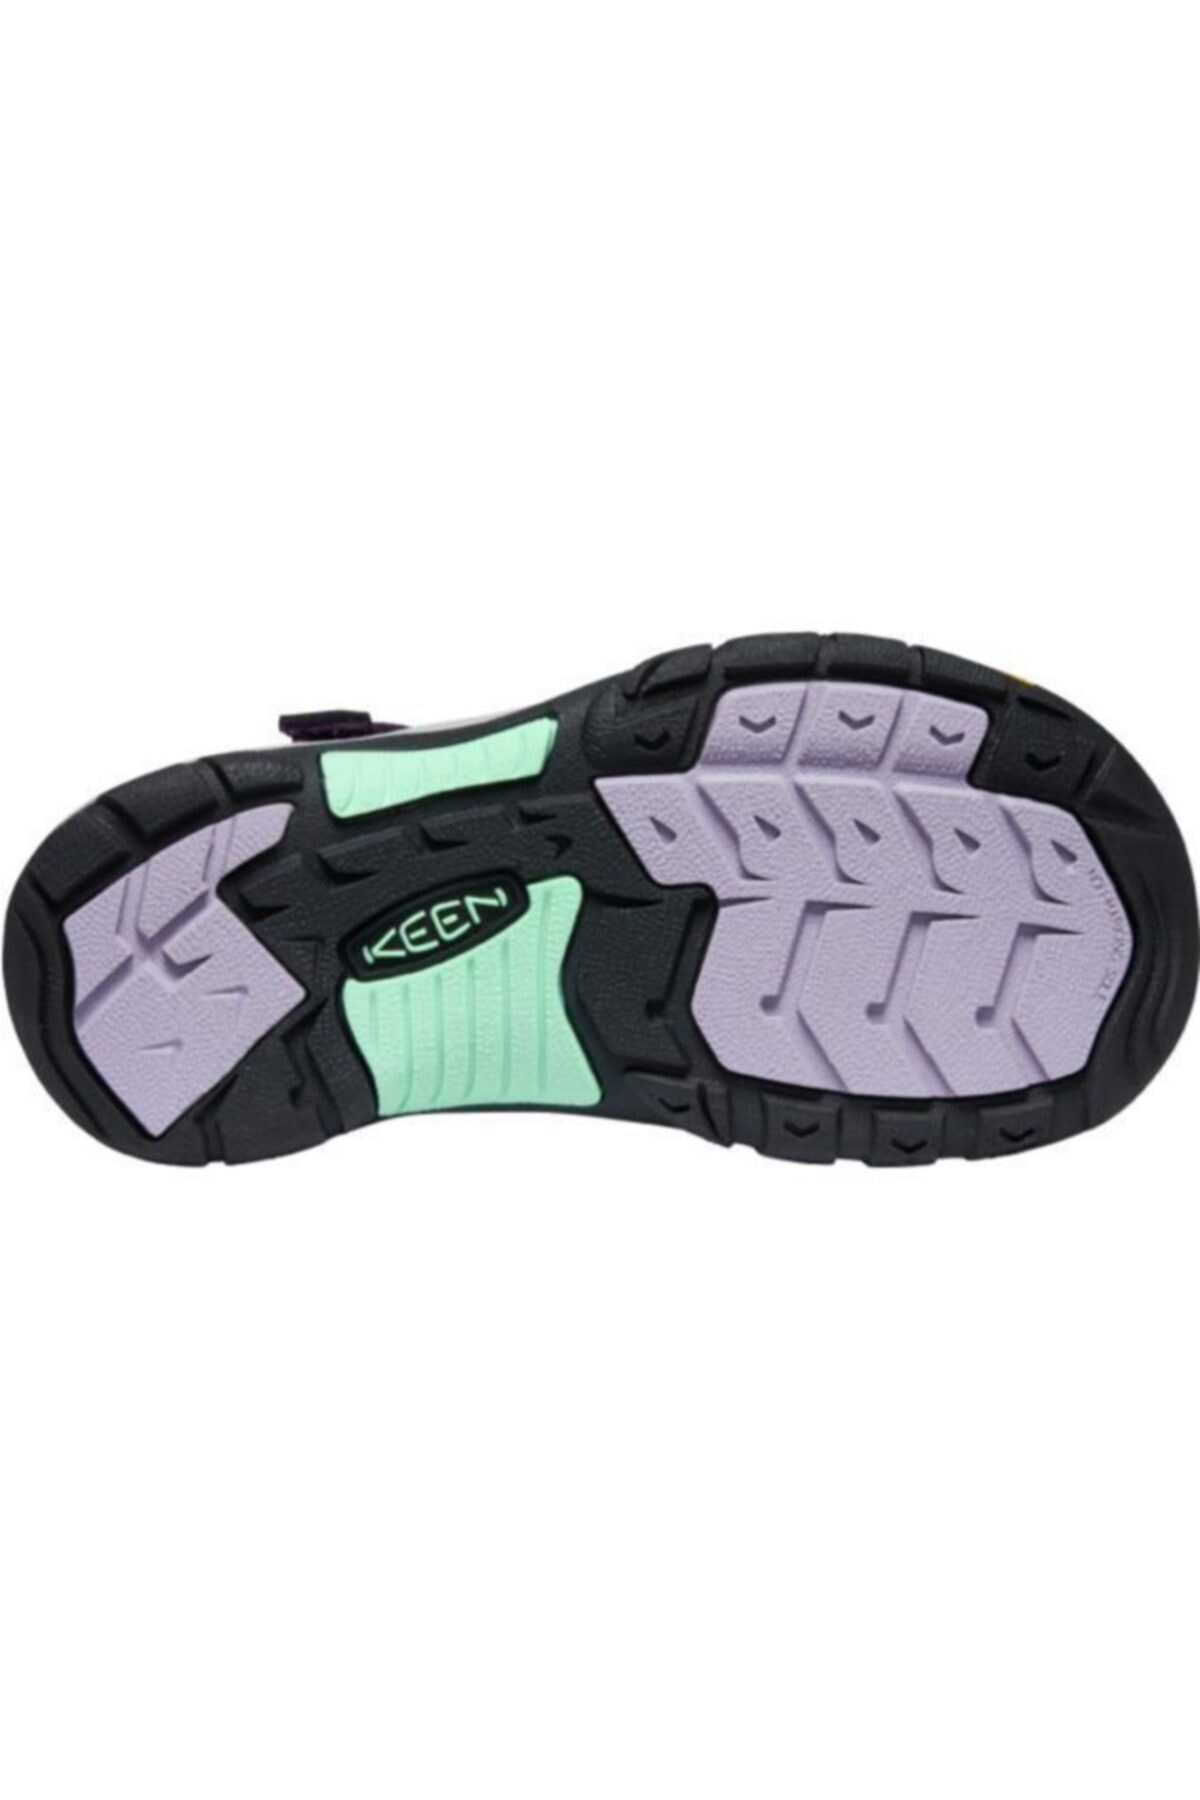 Keen Newport H2 Genç Sandalet Mor 2